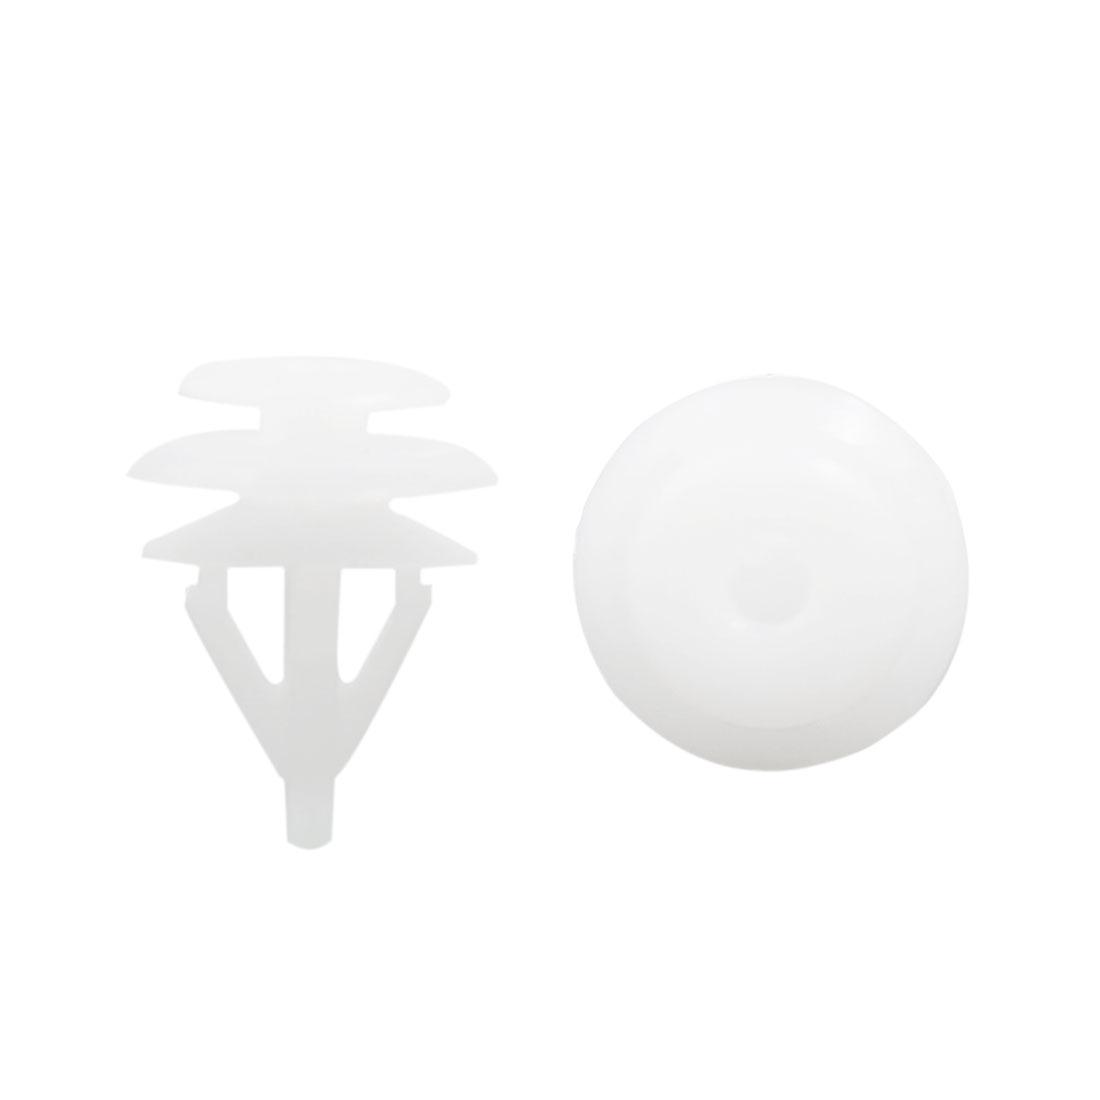 100Pcs 11mm Hole Dia Plastic Rivets Fastener Clips White for Car Auto Fender